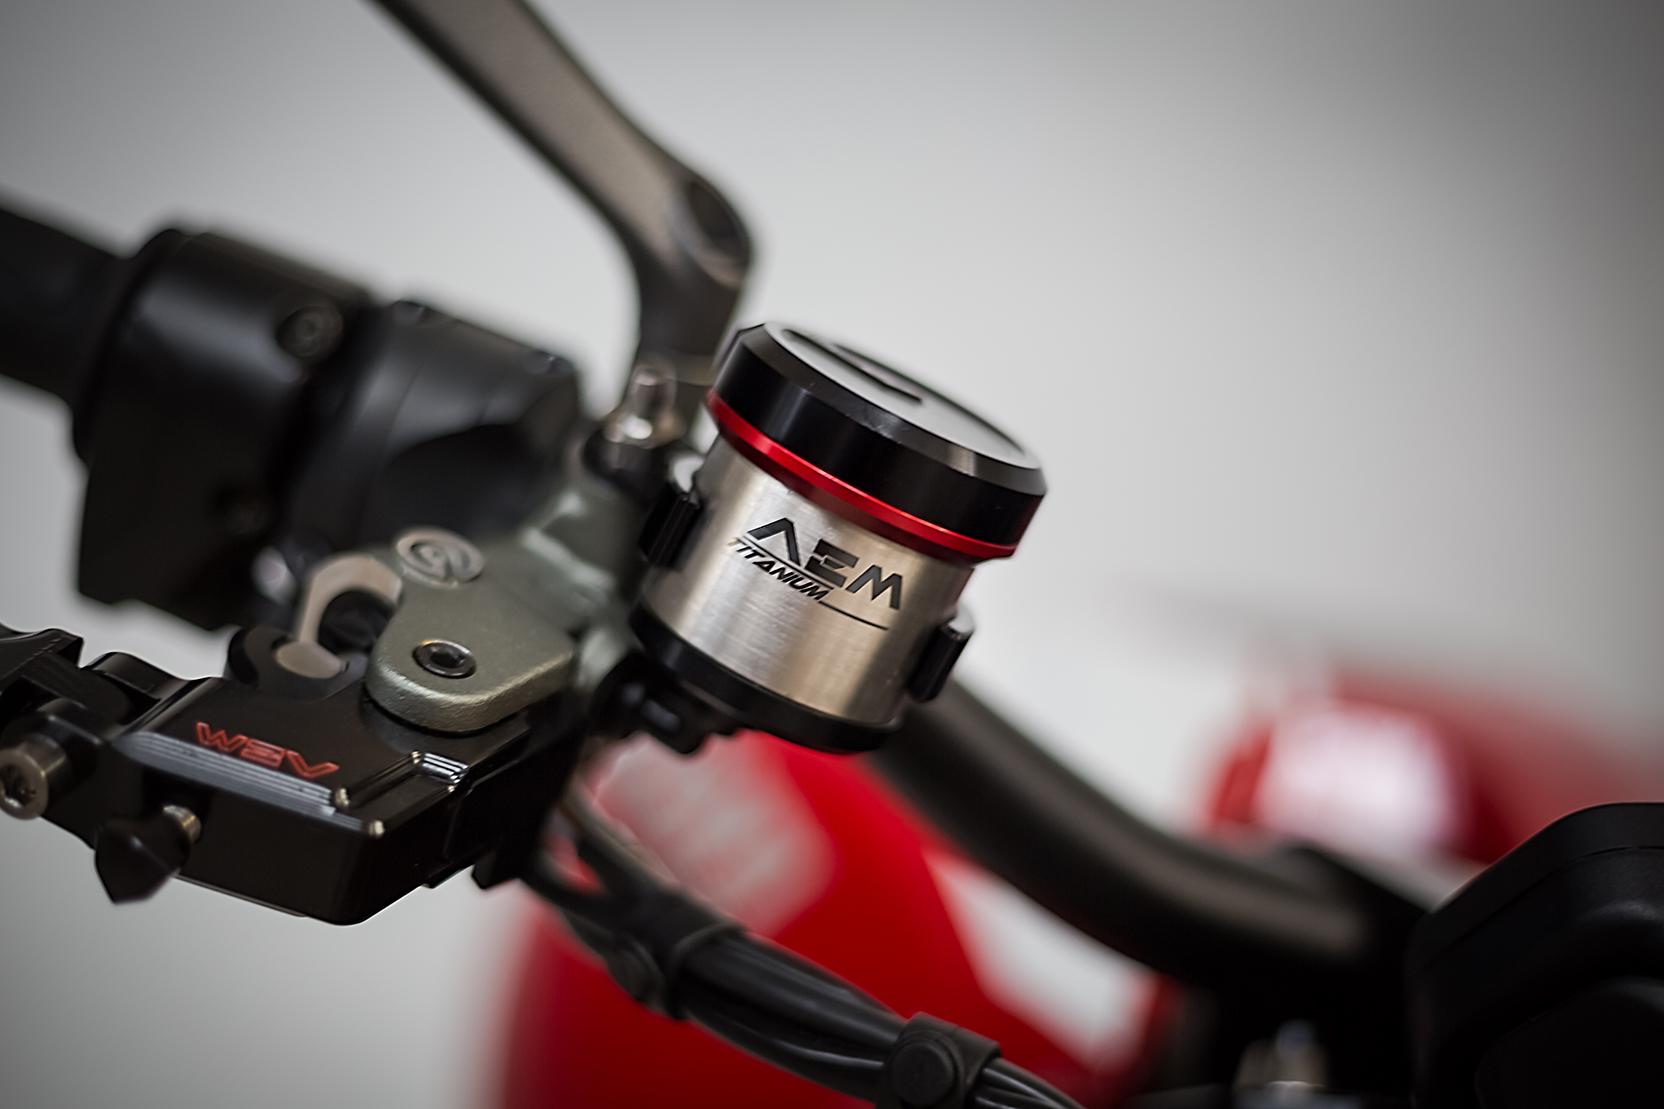 AEM Factory Ducati MV Agusta Titanium Brake + Clutch Reservoir Fluid Tanks